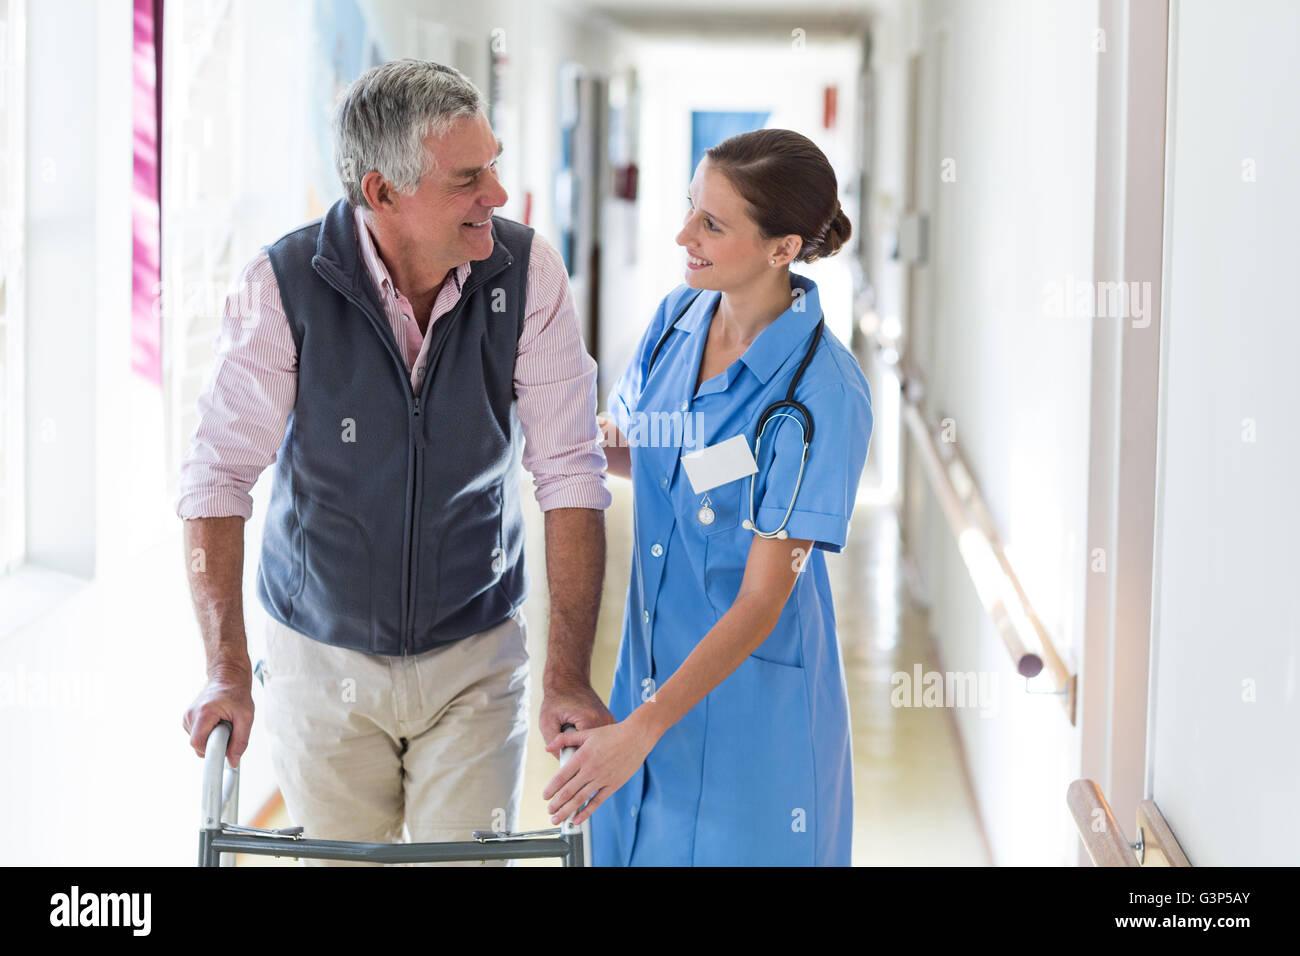 nurse helping senior patient with walking frame stock photo